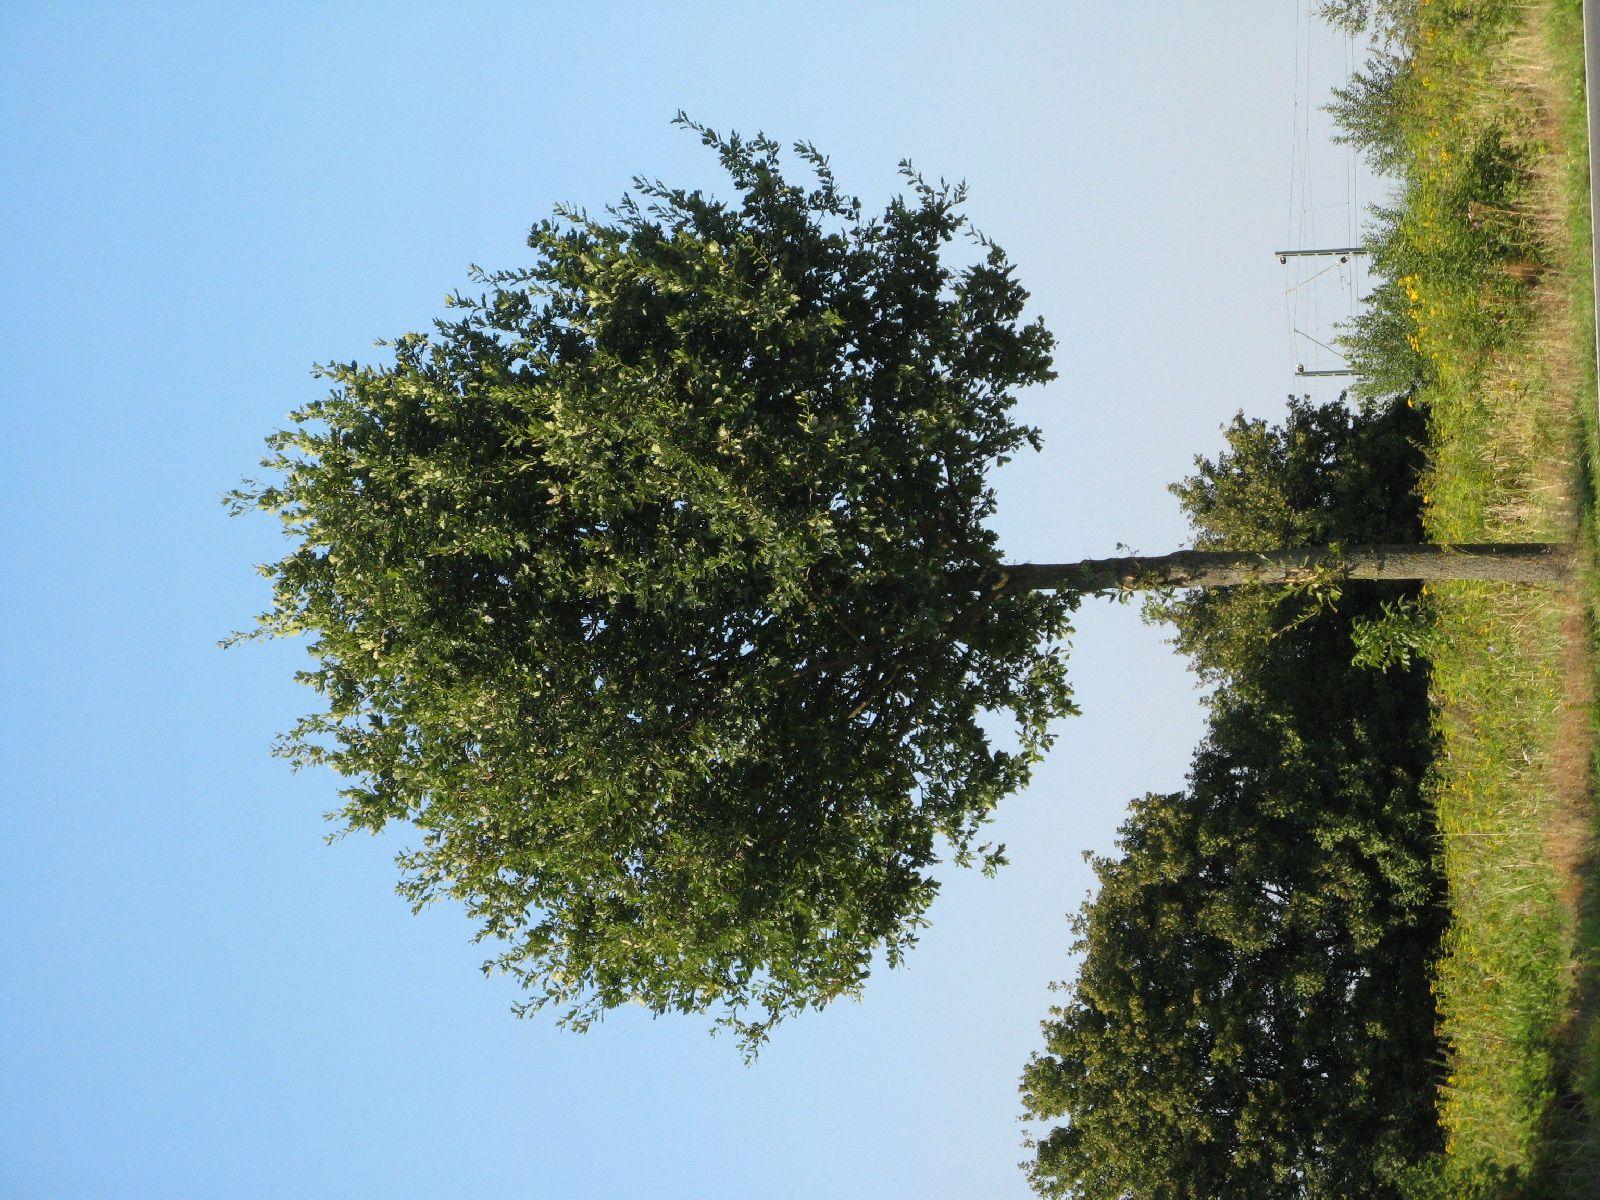 Plants-Trees_Photo_Texture_B_1190